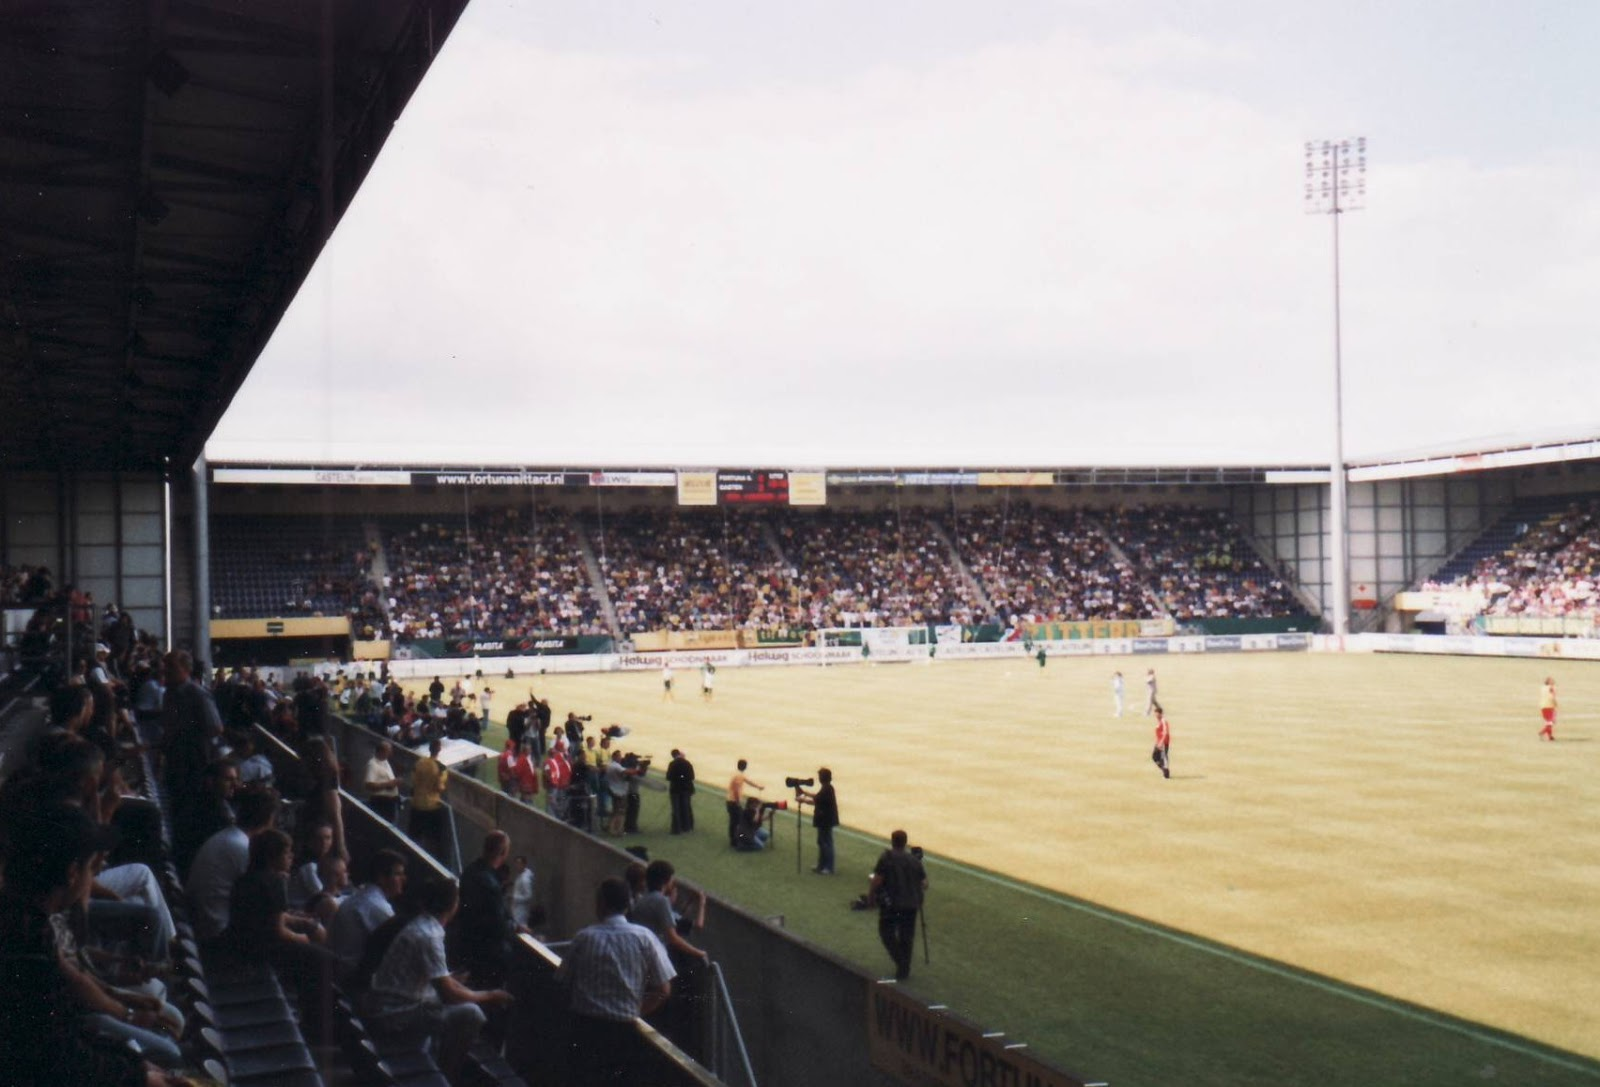 Extreme Football Tourism Netherlands Fortuna Sittard 1999